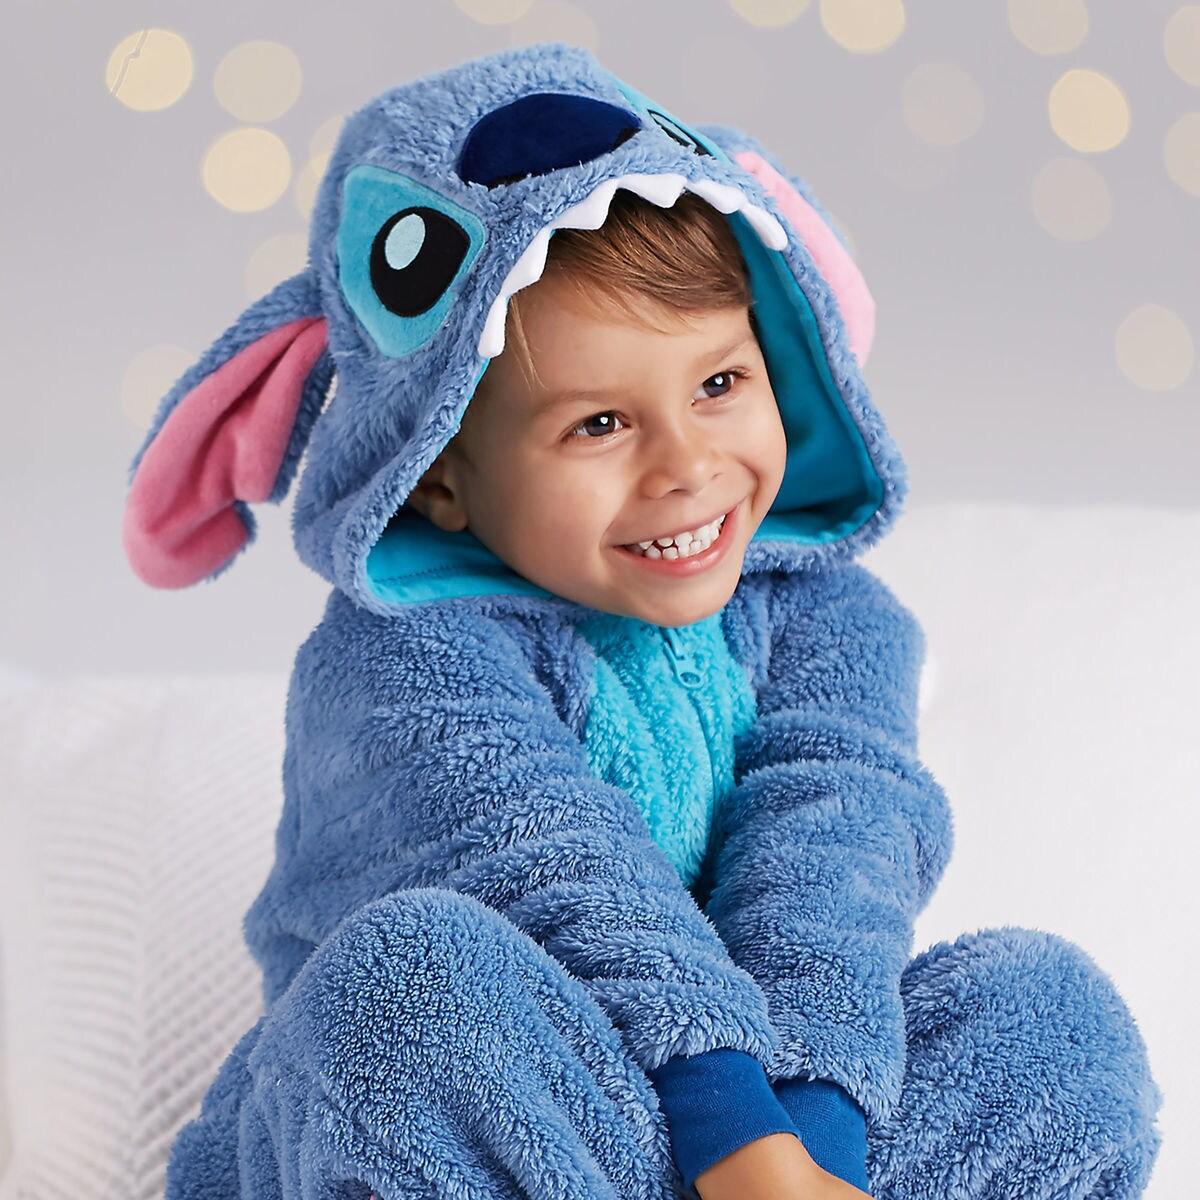 Disney 迪士尼 史迪奇shopDisney儿童抓绒连体睡衣 $16.99(约117元)